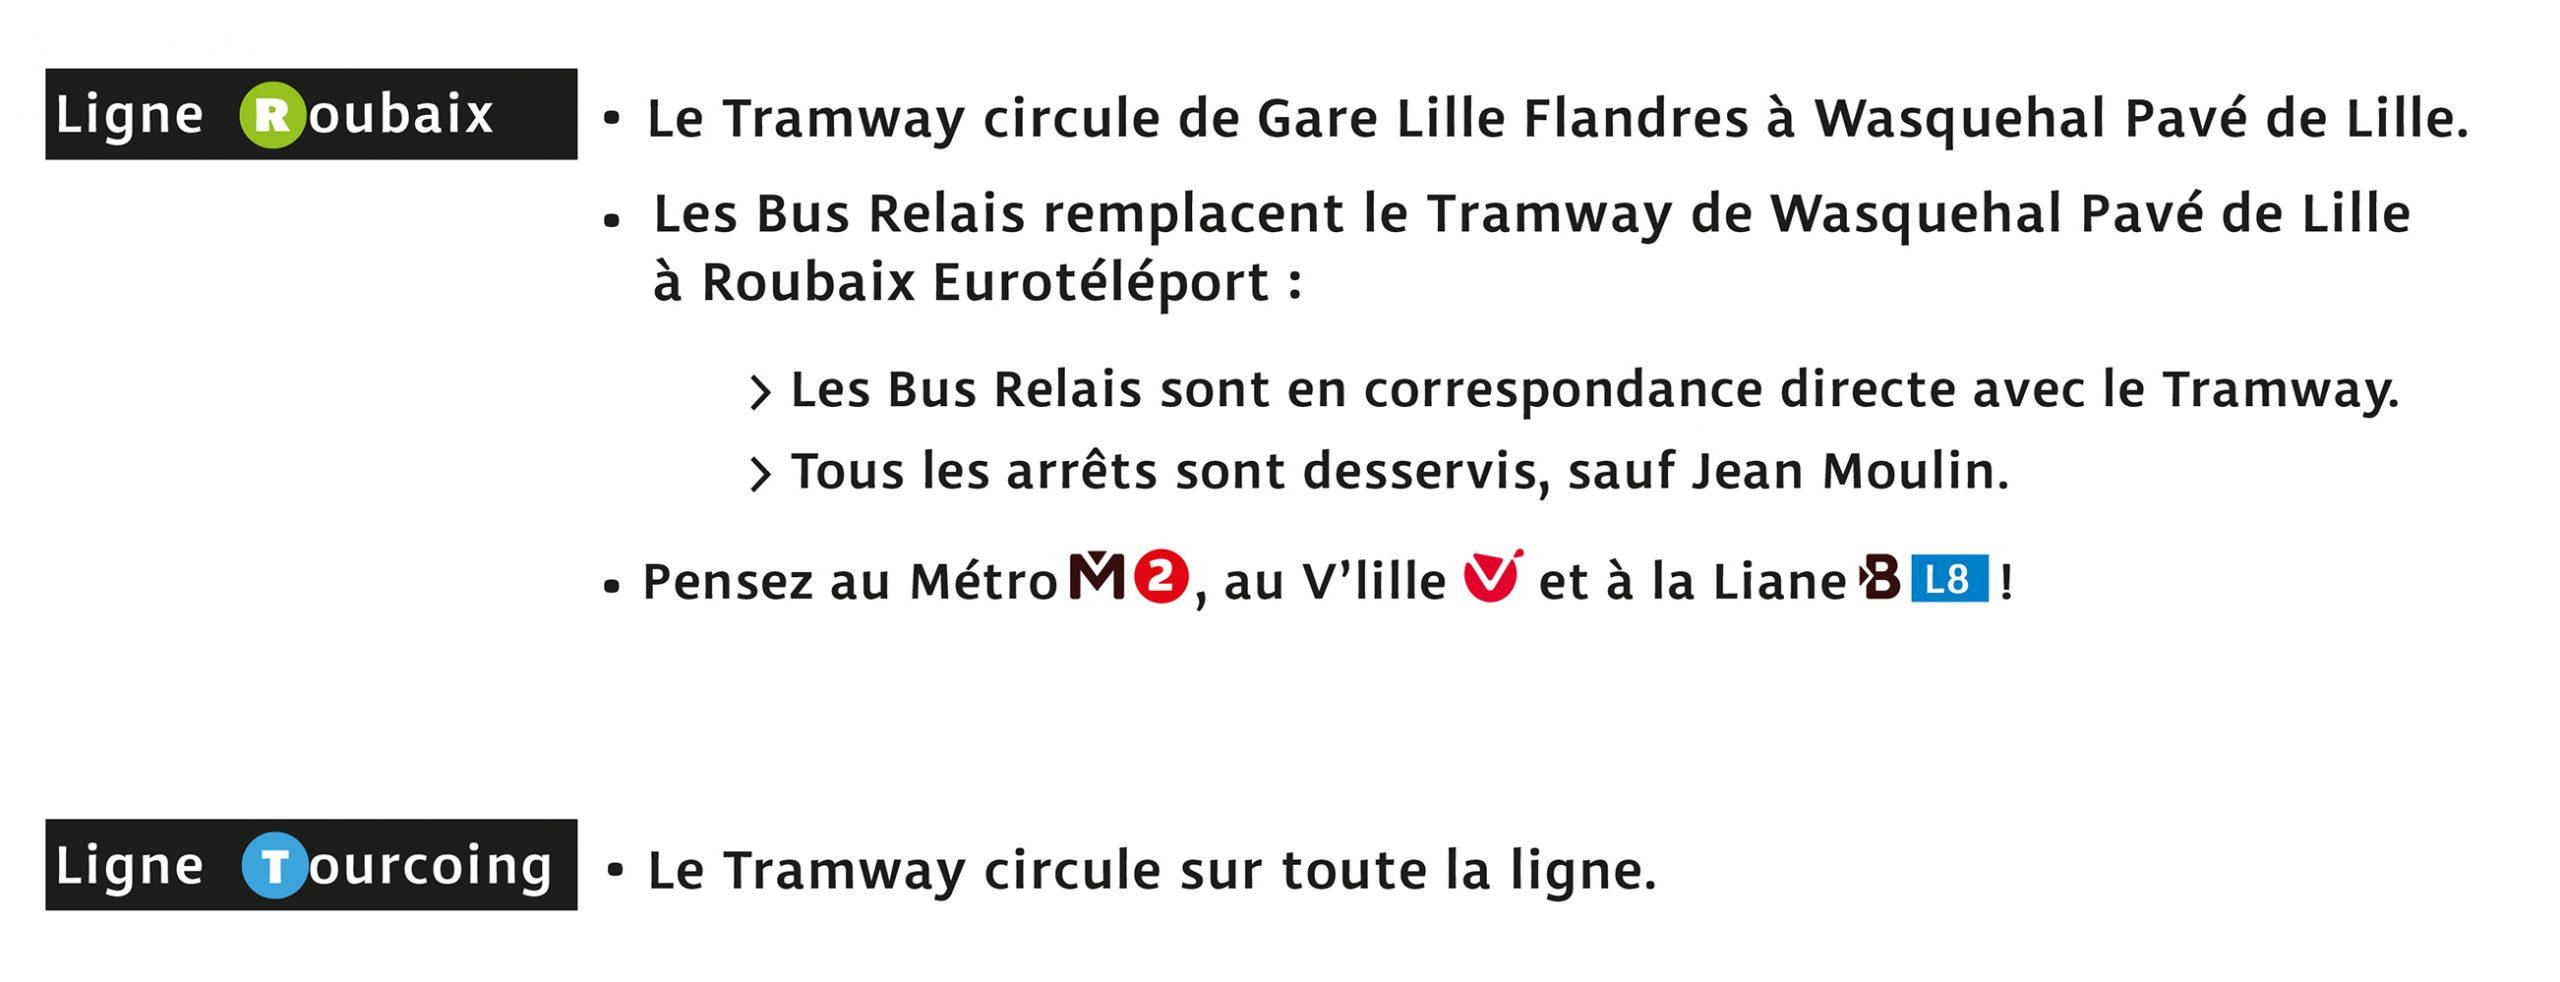 Travaux Tram Ligne R